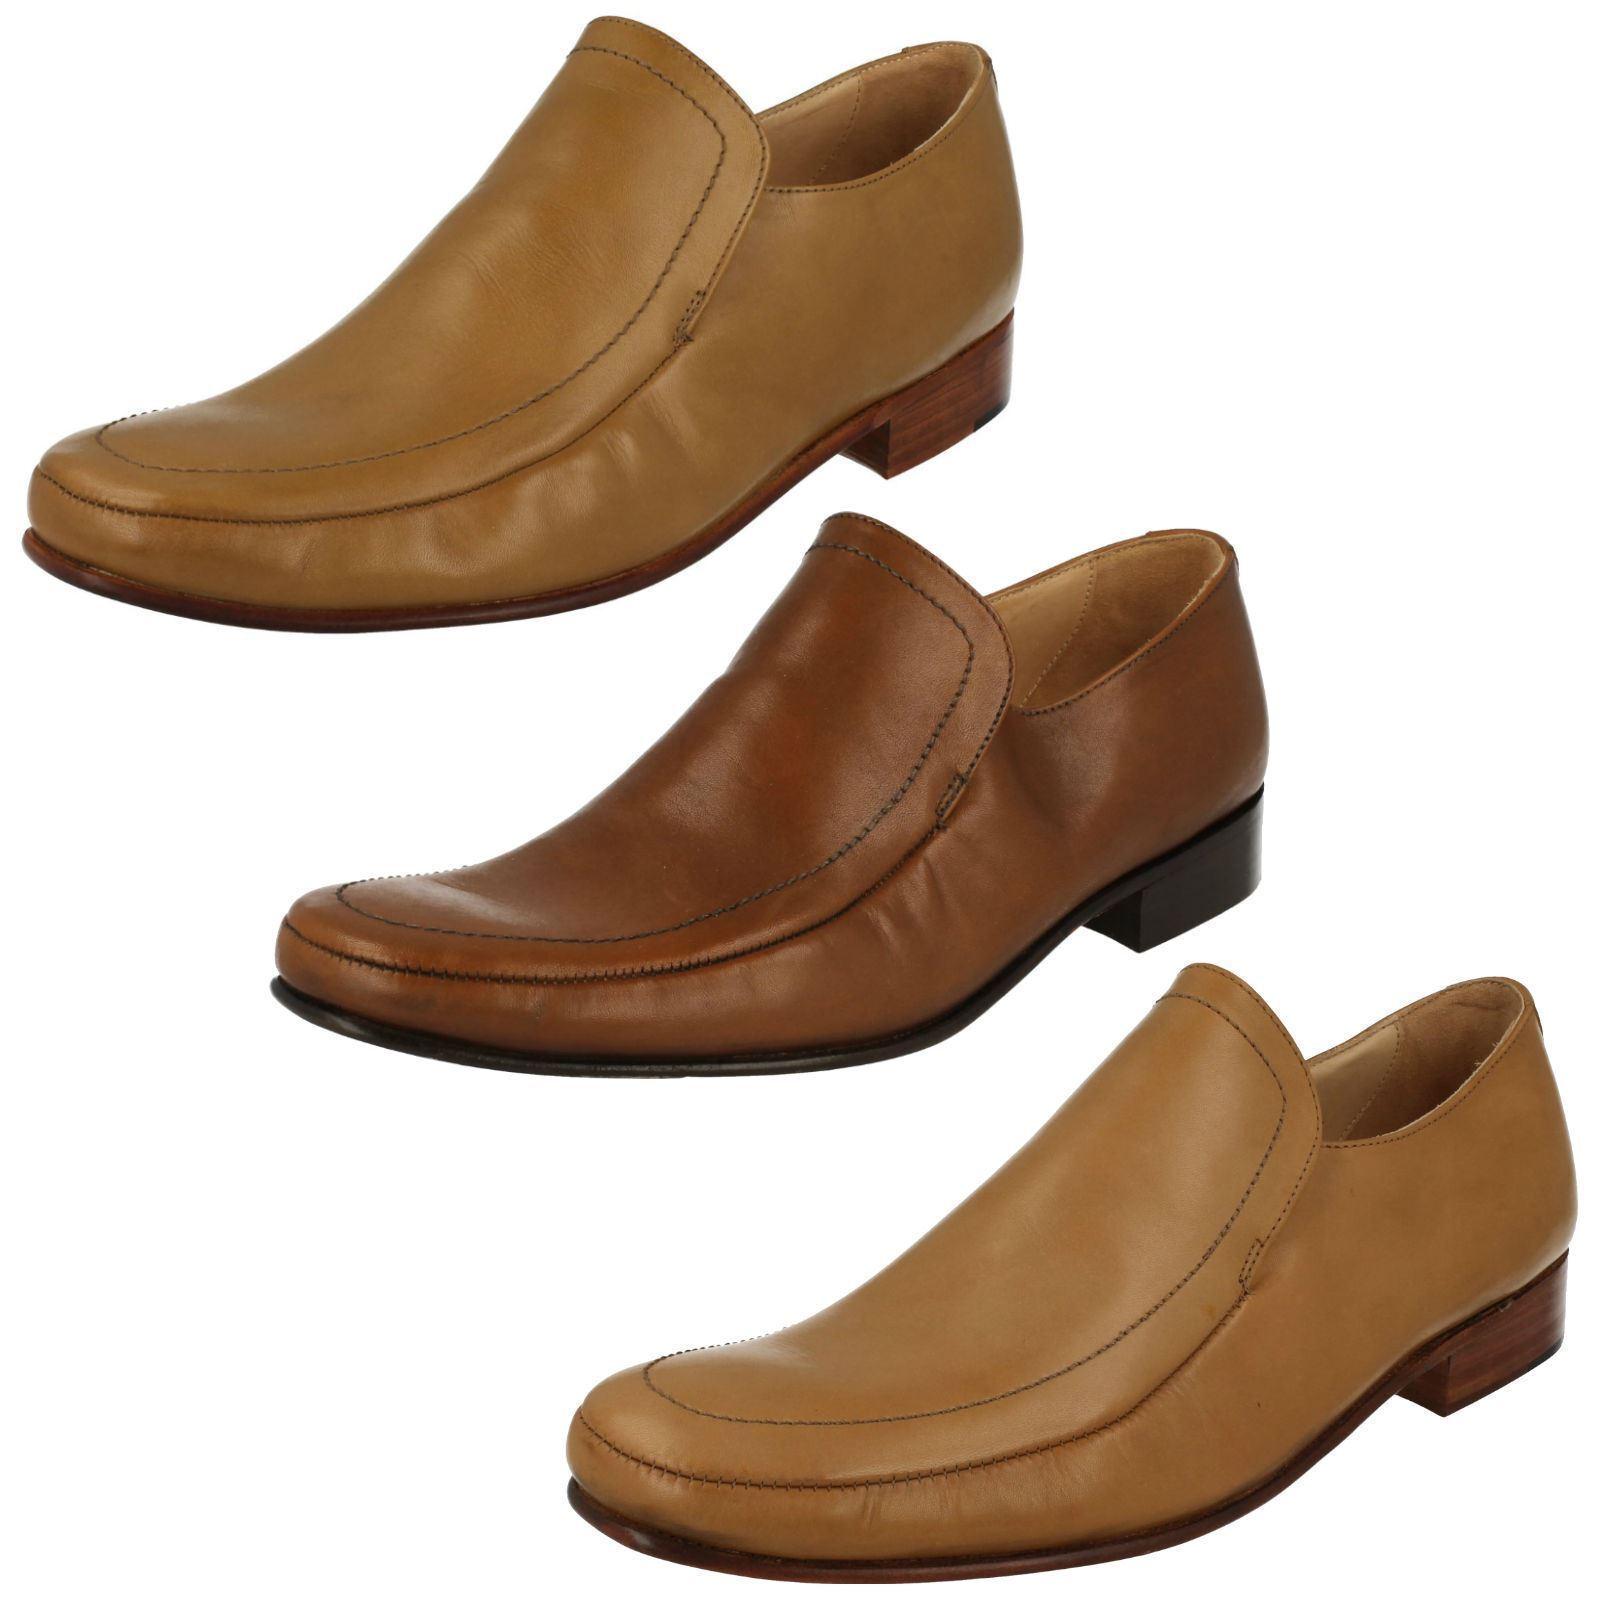 Herren GRENSON DAKOTA FORMAL SMART CASUAL BROWN TAN TAN BROWN SLIP ON Schuhe UK SIZE 7.5 - 11 4d2930